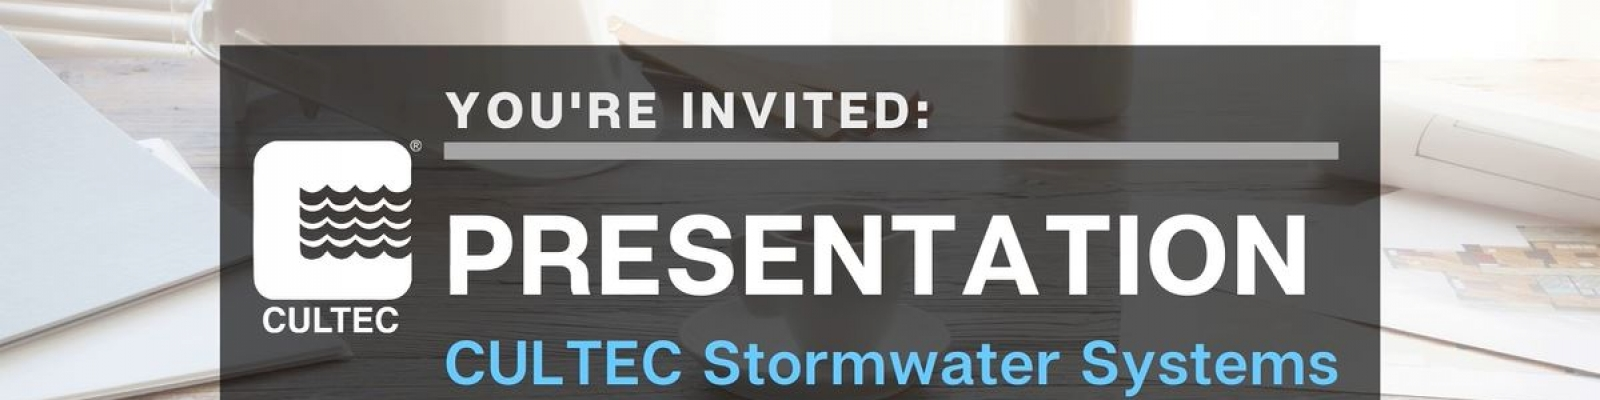 CULTEC Stormwater Chamber Presentation Promo